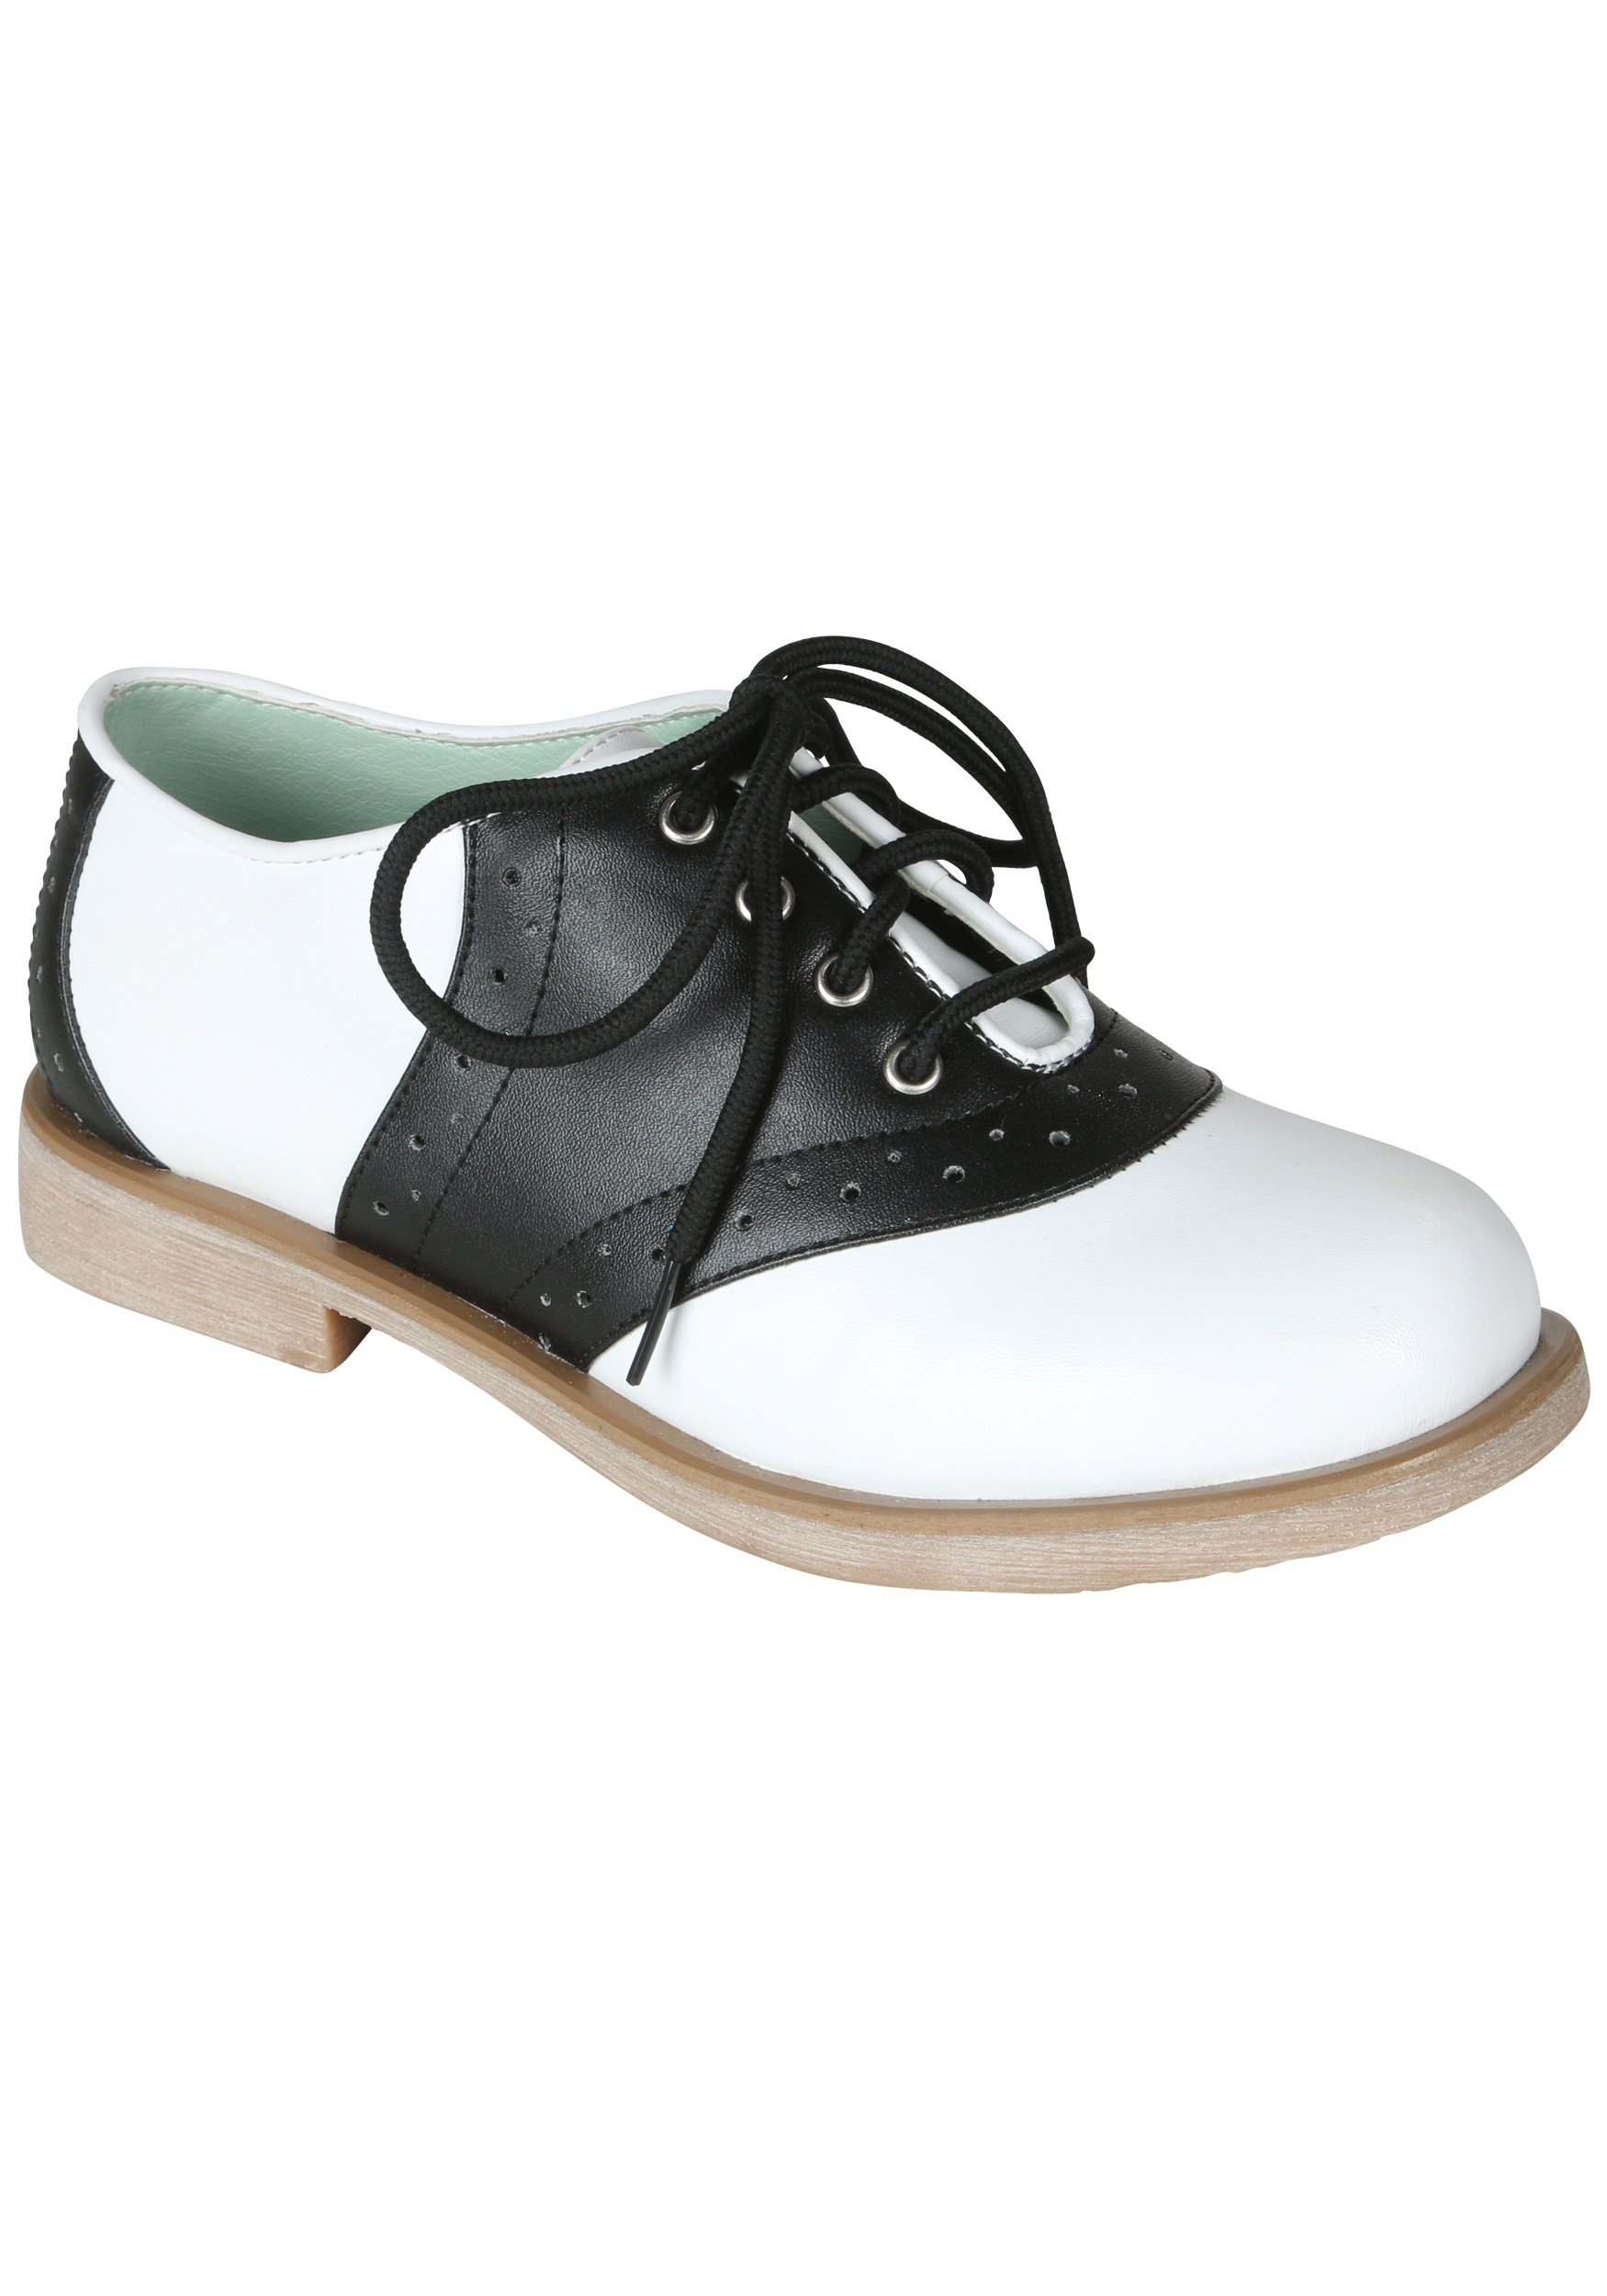 Kids Saddle Shoes ebf85f9d4